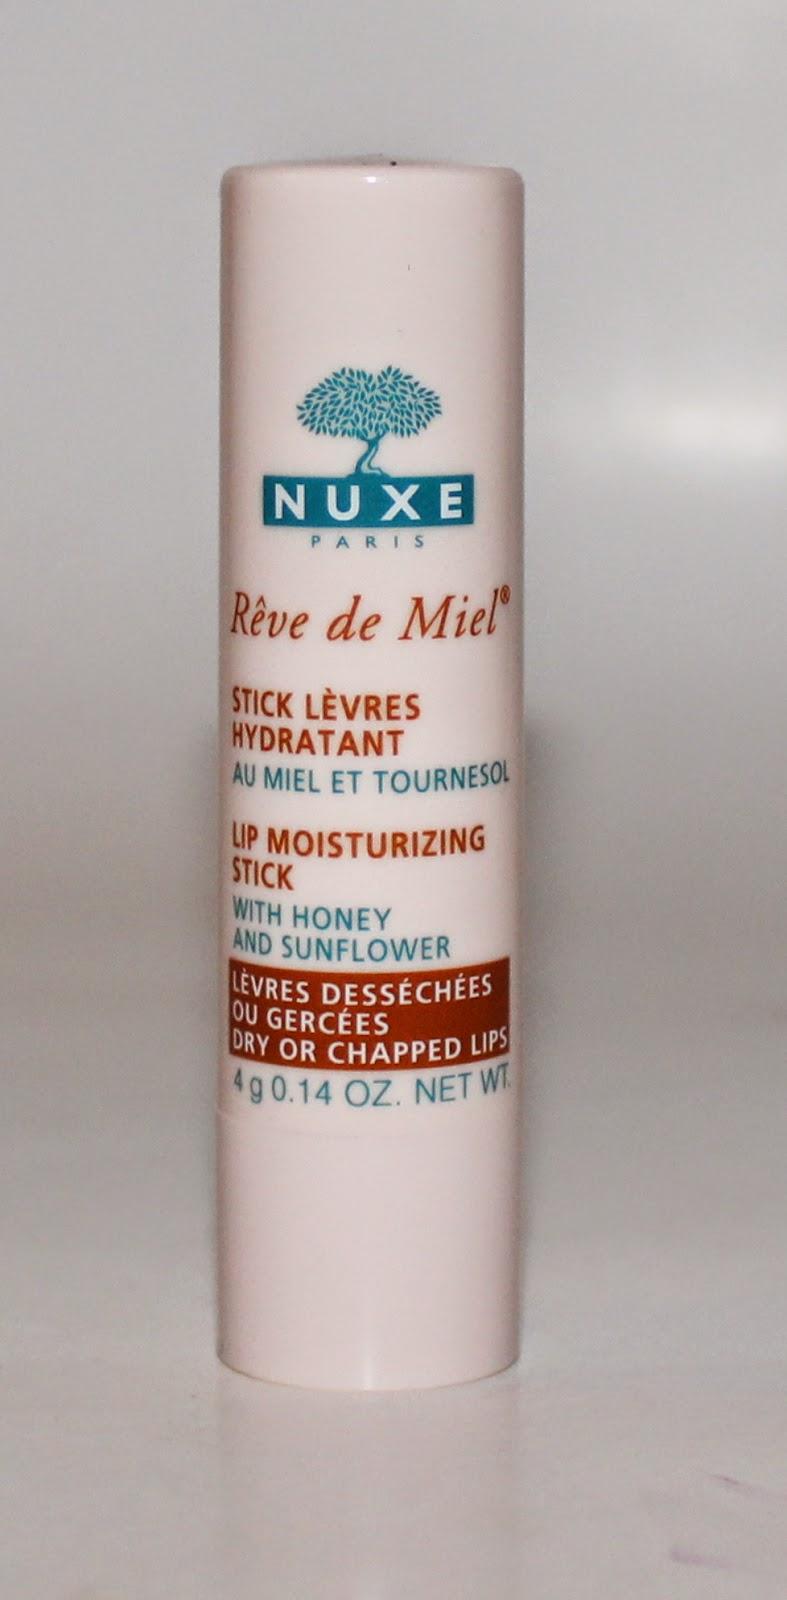 Nuxe Rêve de Miel Lip Moisturizing Stick